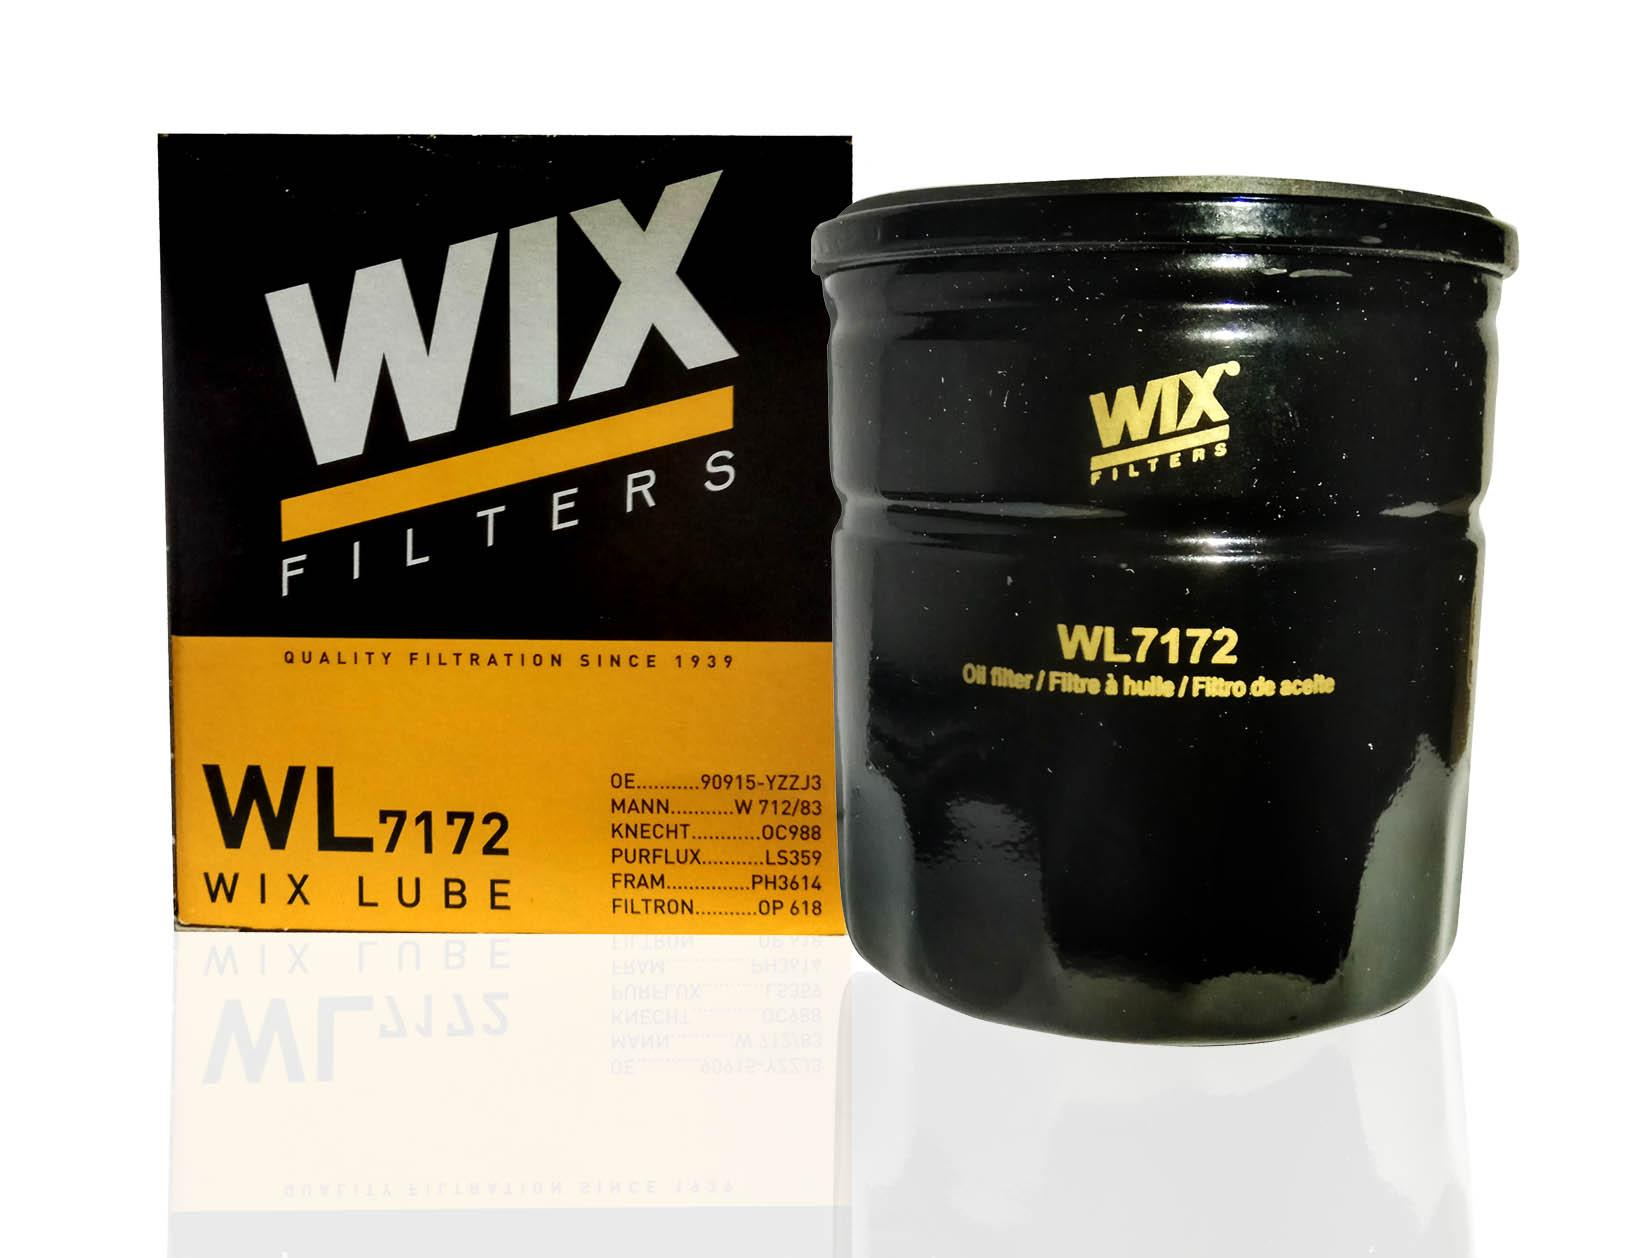 Oil Filter For Sale Adapter Online Brands Prices 2008 Pt Cruiser Fuel Location Wix Wl7172 Toyota Revo Innova Fortuner Rav4 Grandia Hi Ace Land